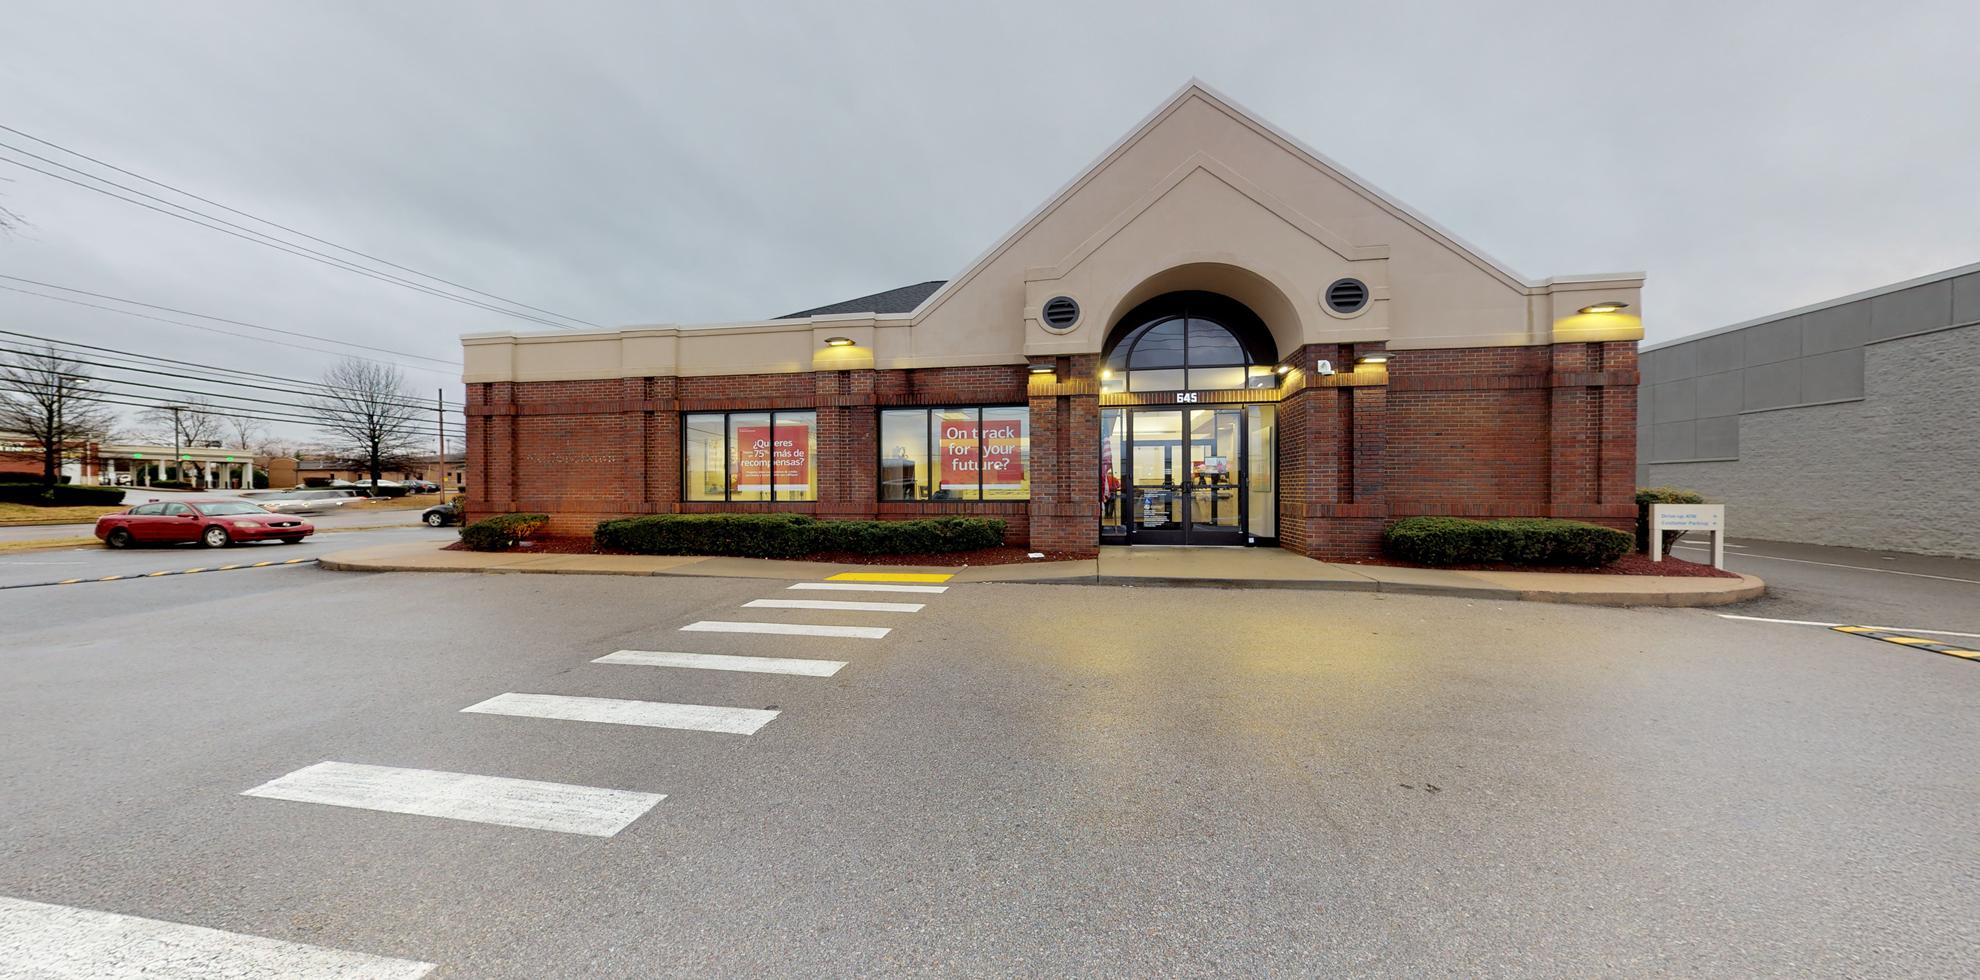 Bank of America financial center with drive-thru ATM | 645 Thompson Ln, Nashville, TN 37204